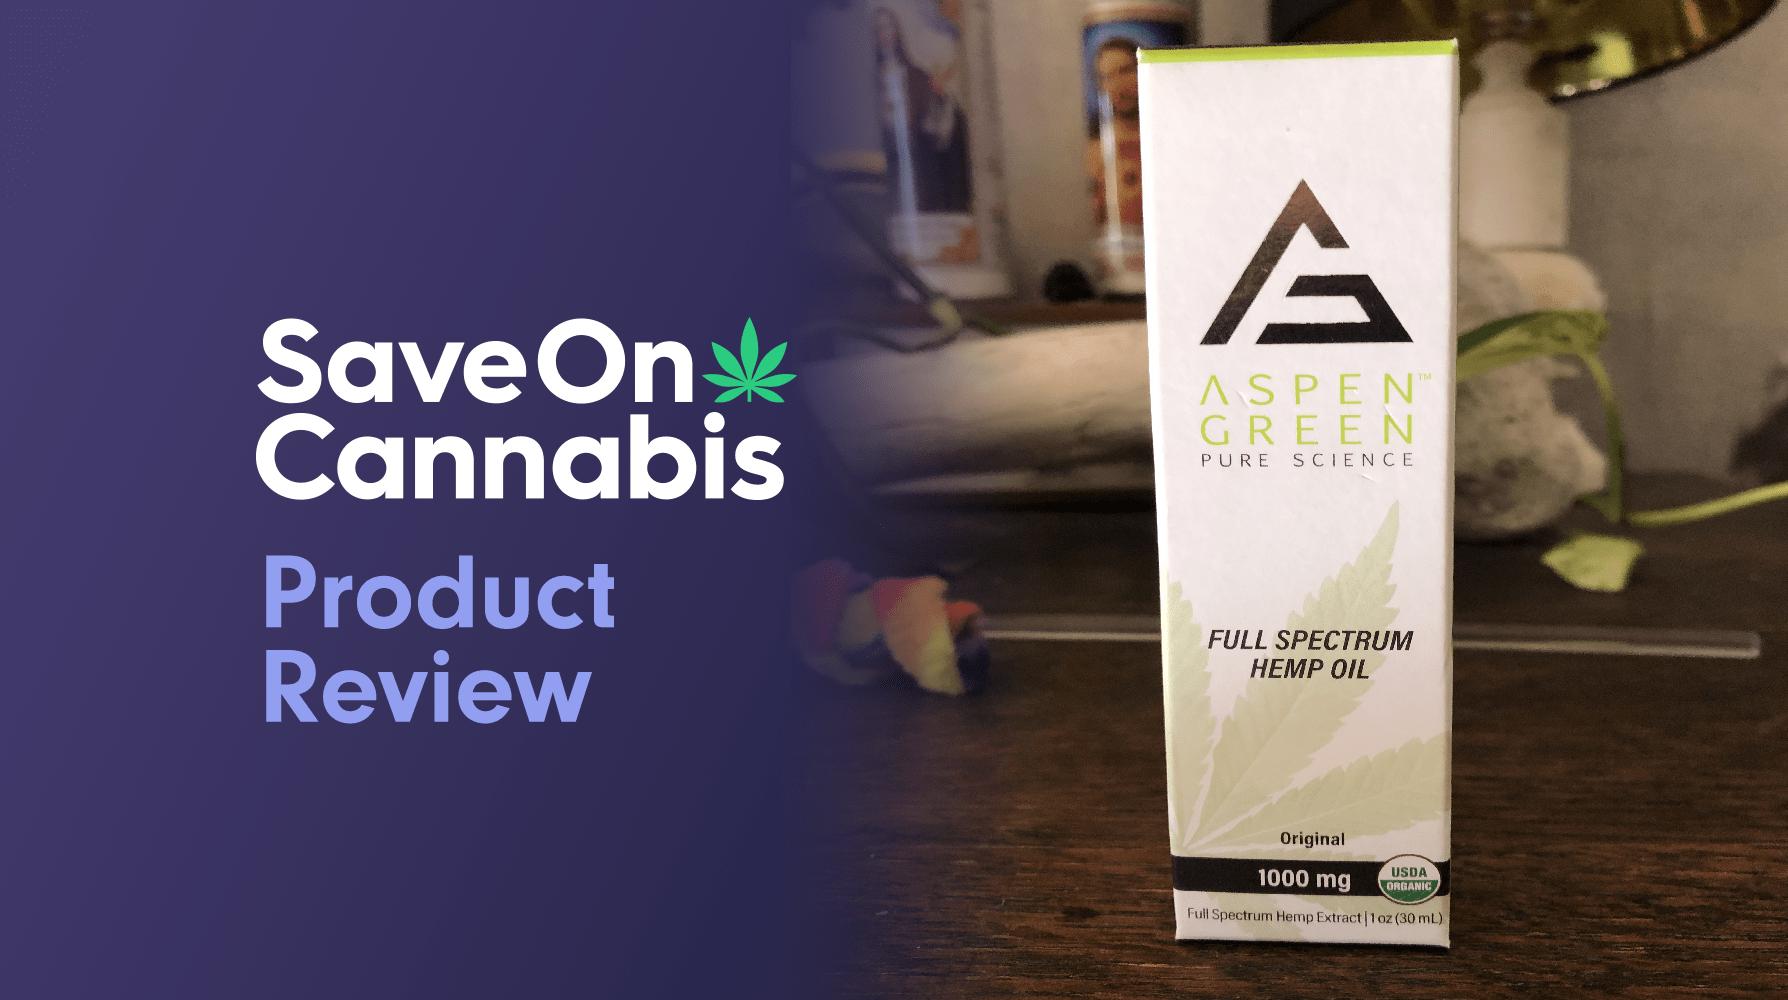 aspen green full spectrum hemp oil 1,000 mg review save on cannabis website